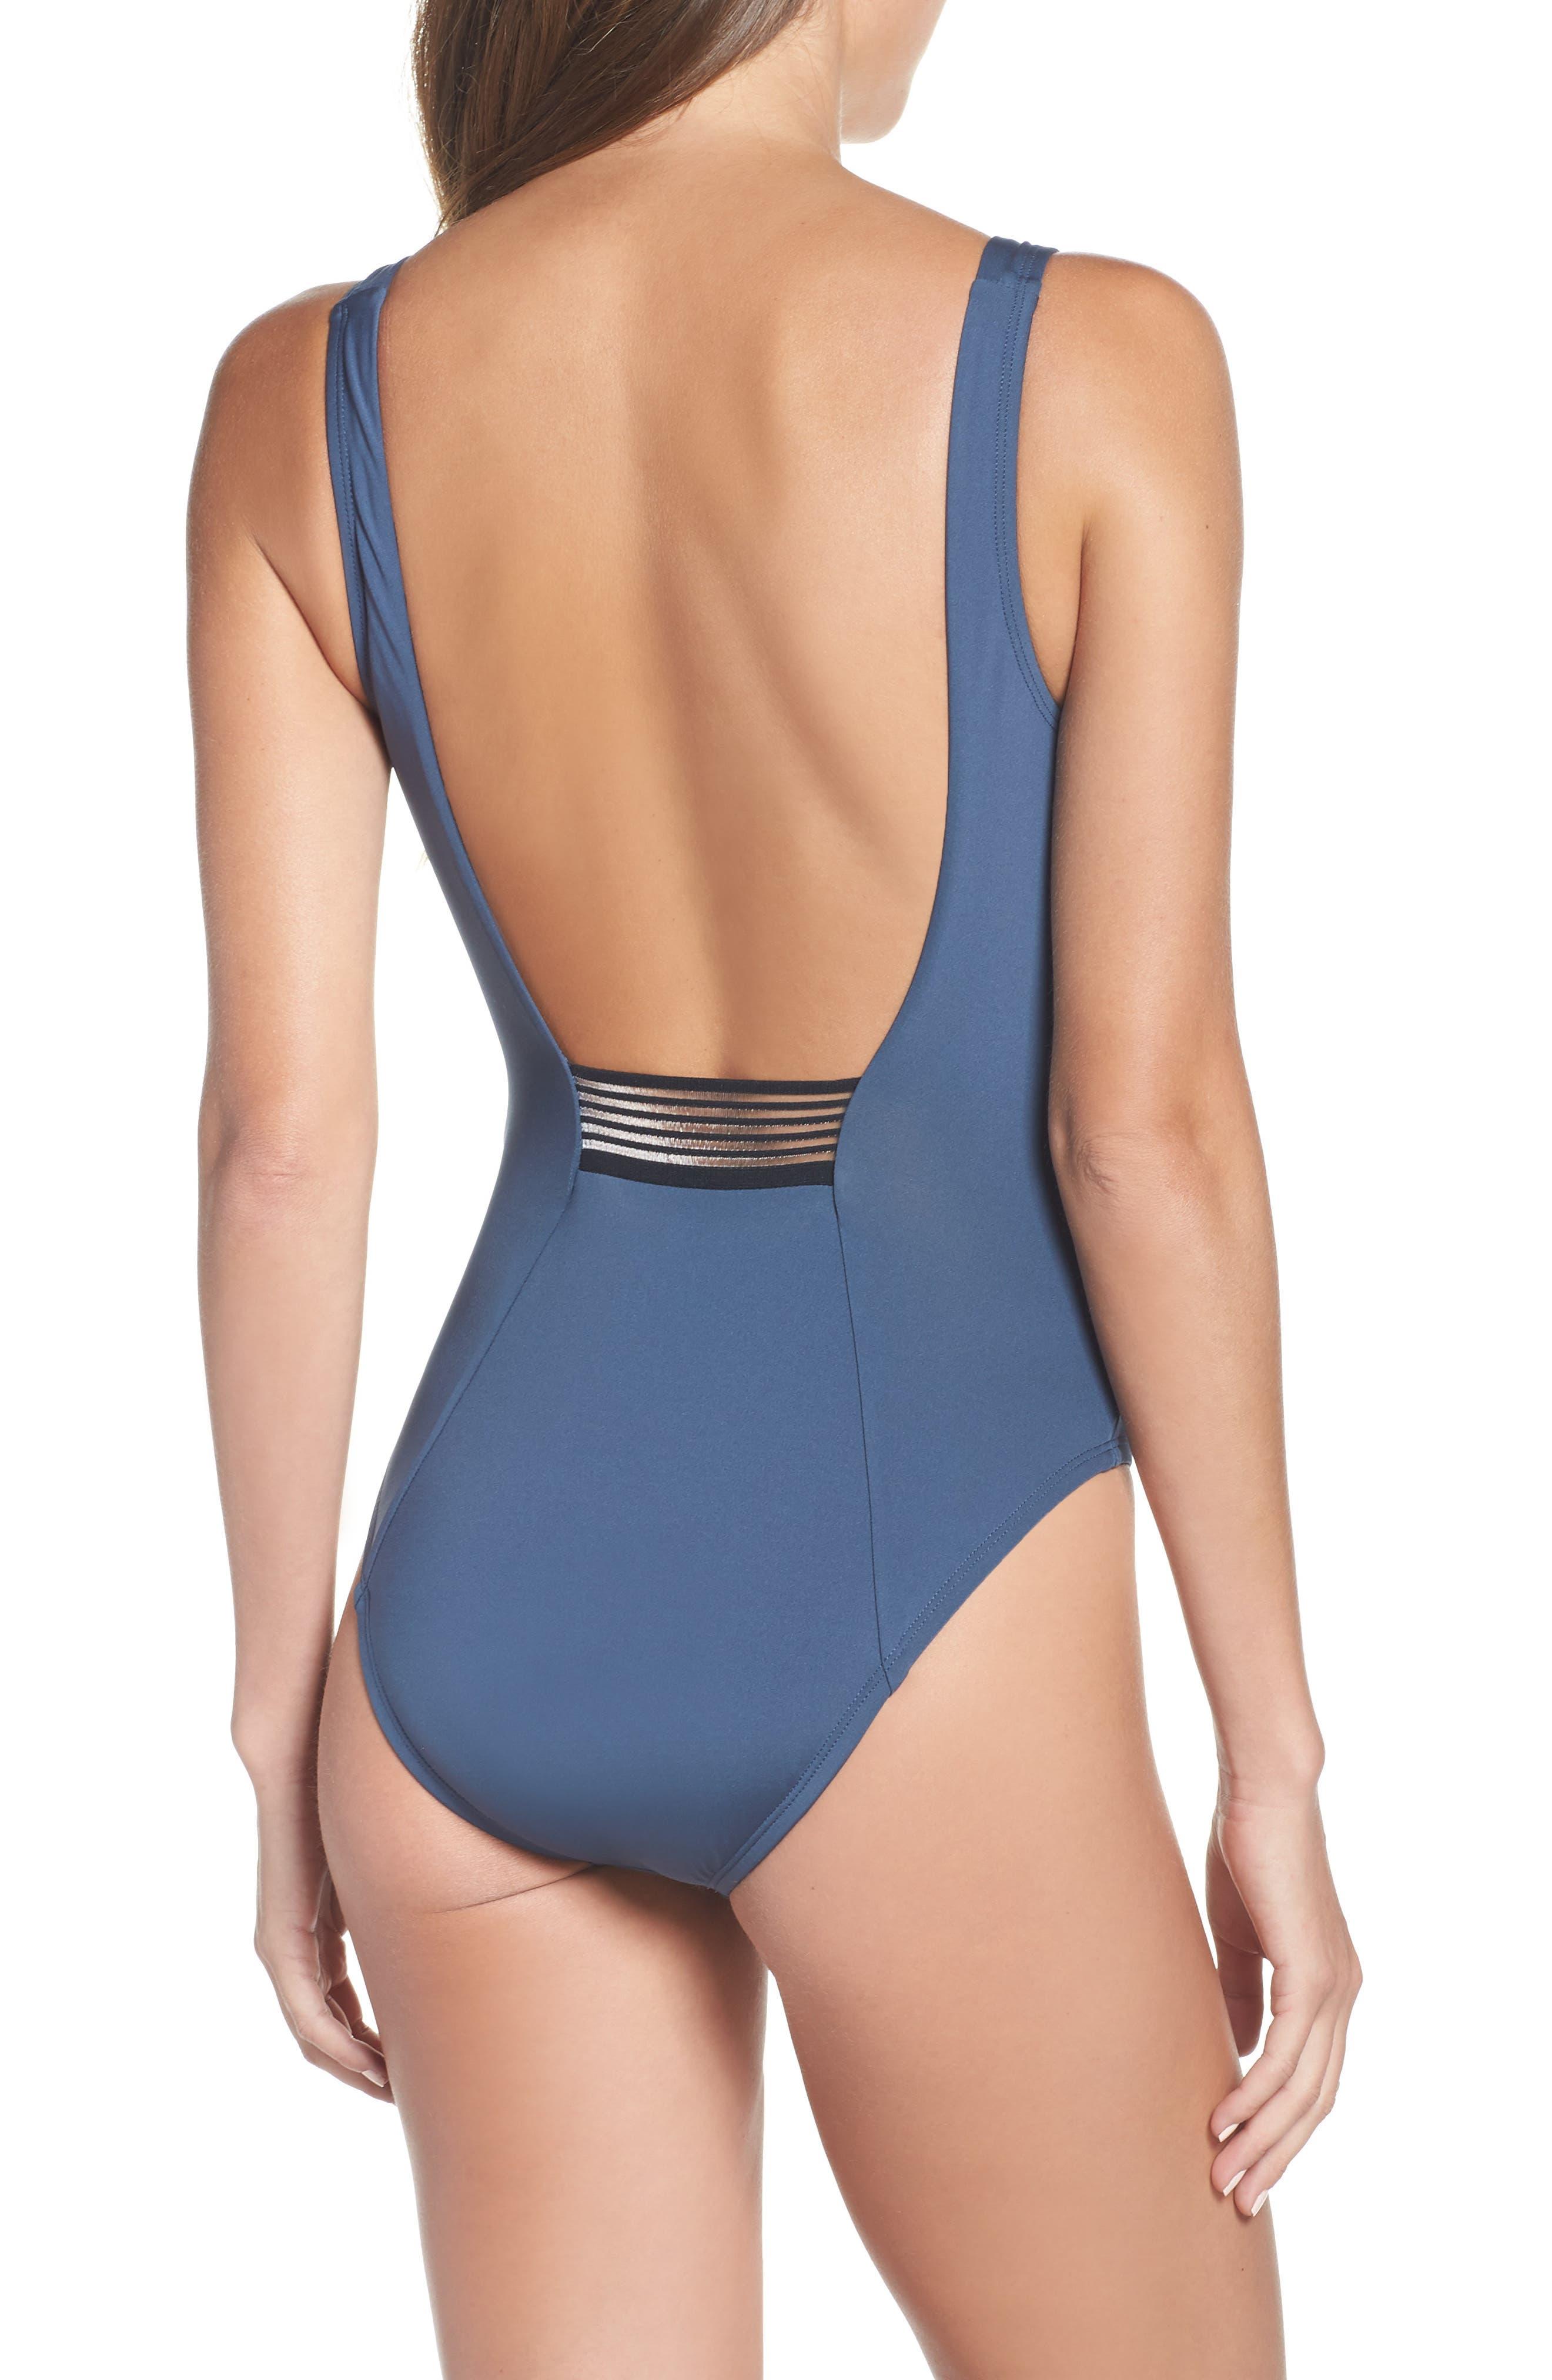 NIKE, U-Back One-Piece Swimsuit, Alternate thumbnail 2, color, MONSOON BLUE